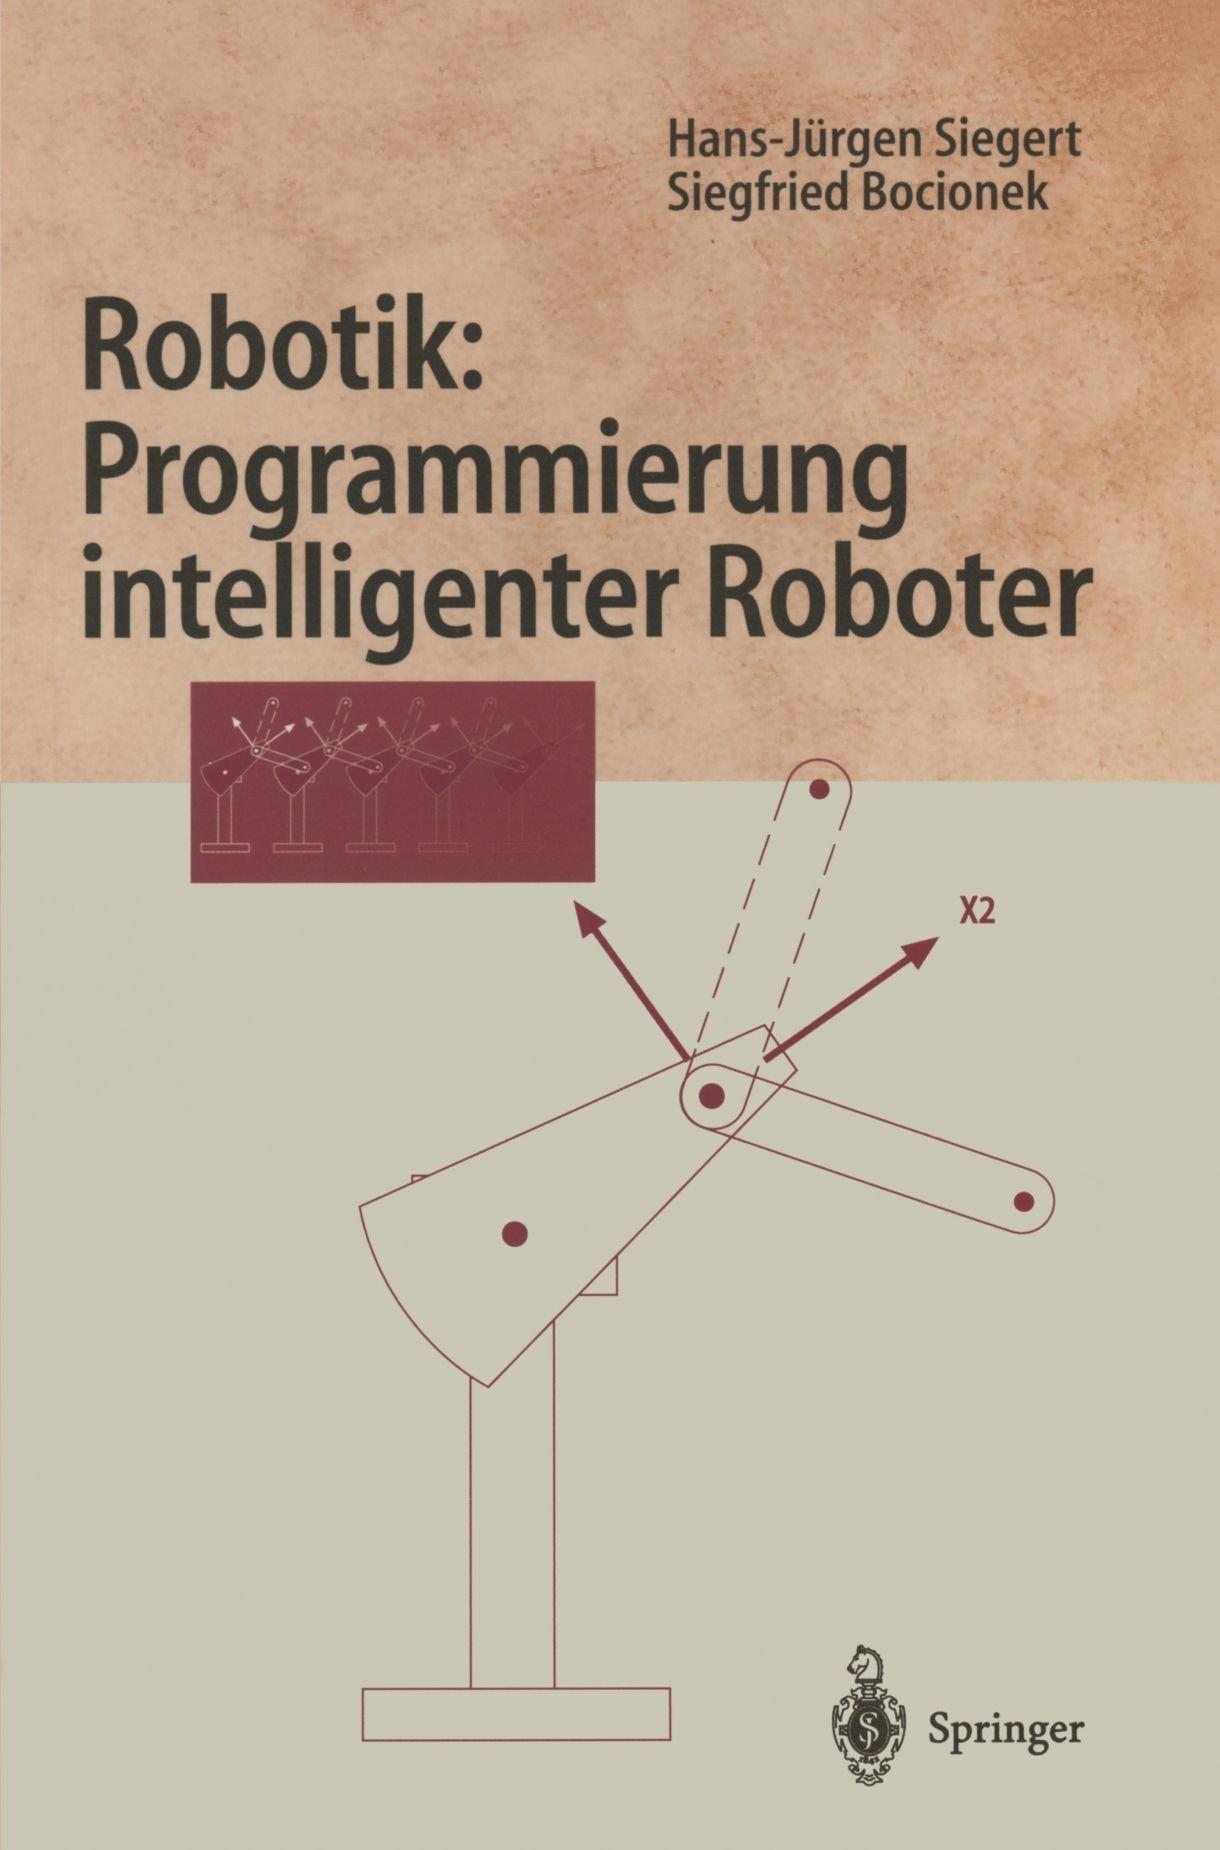 Robotik: Programmierung Intelligenter Roboter (Springer-Lehrbuch) Taschenbuch – 1. Januar 1996 Hans-Jürgen Siegert Springer-Verlag 3540606653 MAK_MNT_9783540606659